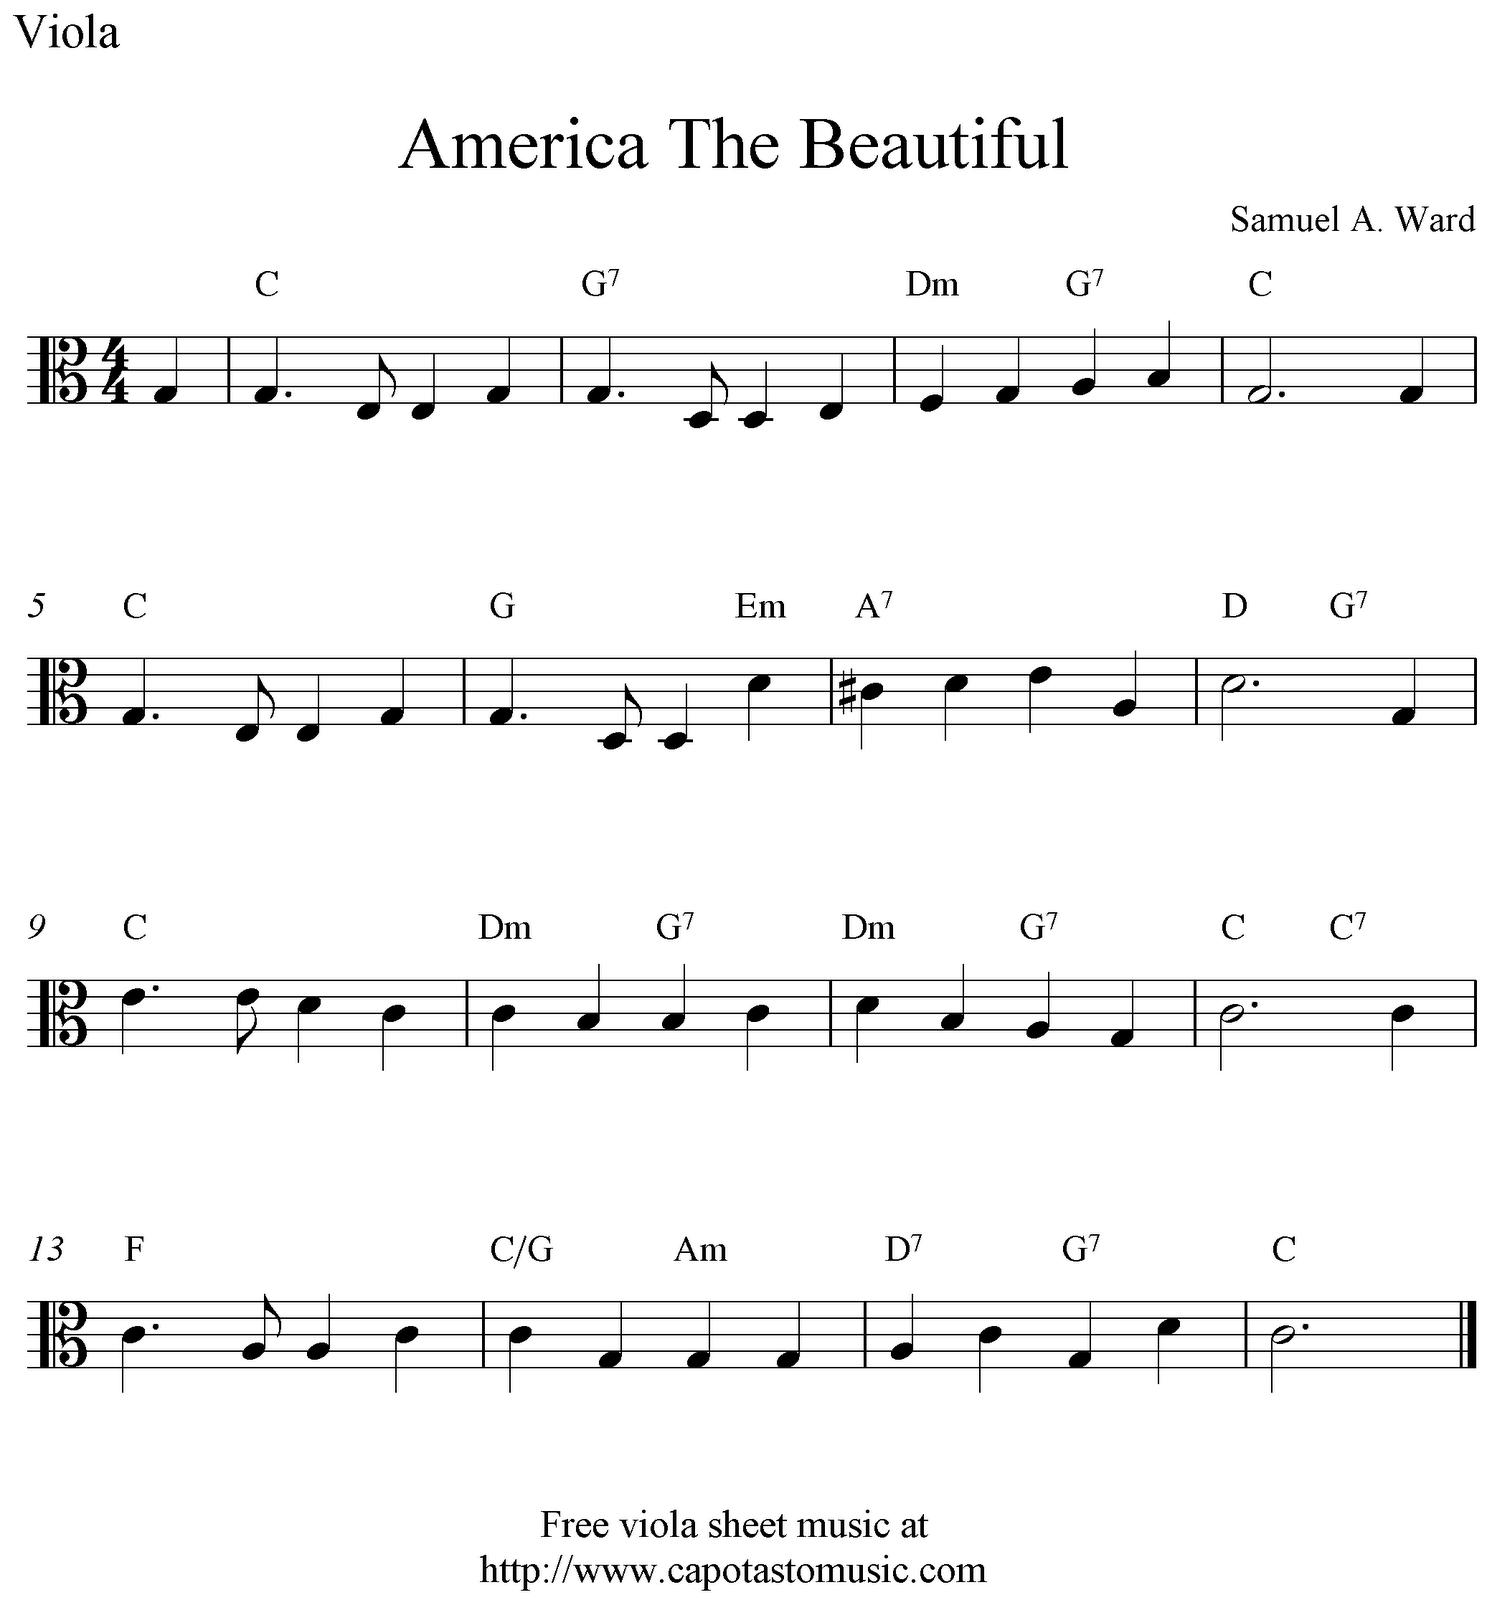 Free Viola Sheet Music, America The Beautiful   Viola Sheet Music In - Viola Sheet Music Free Printable